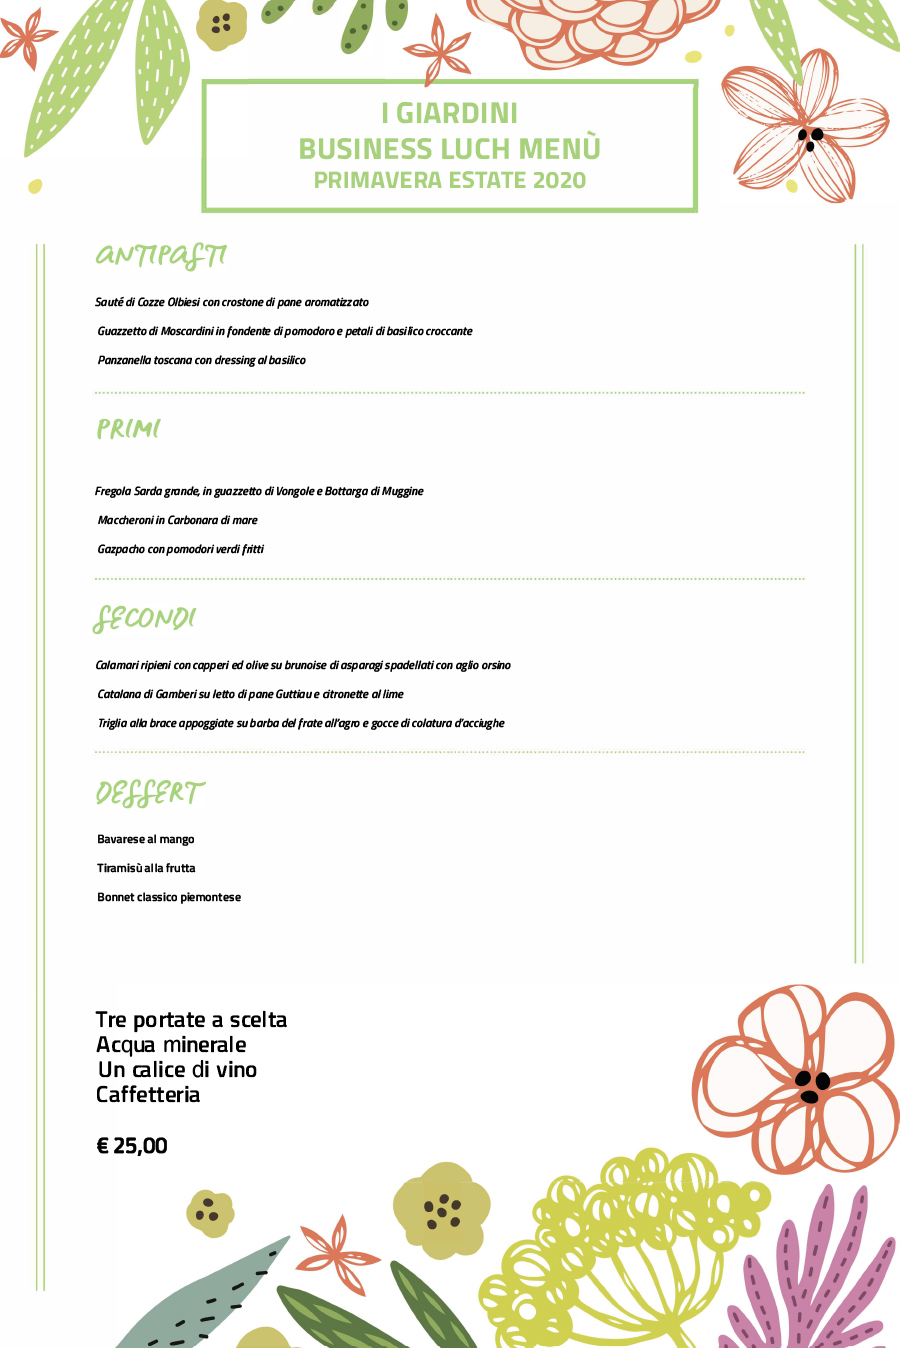 Hotel I Giardini business-lunch